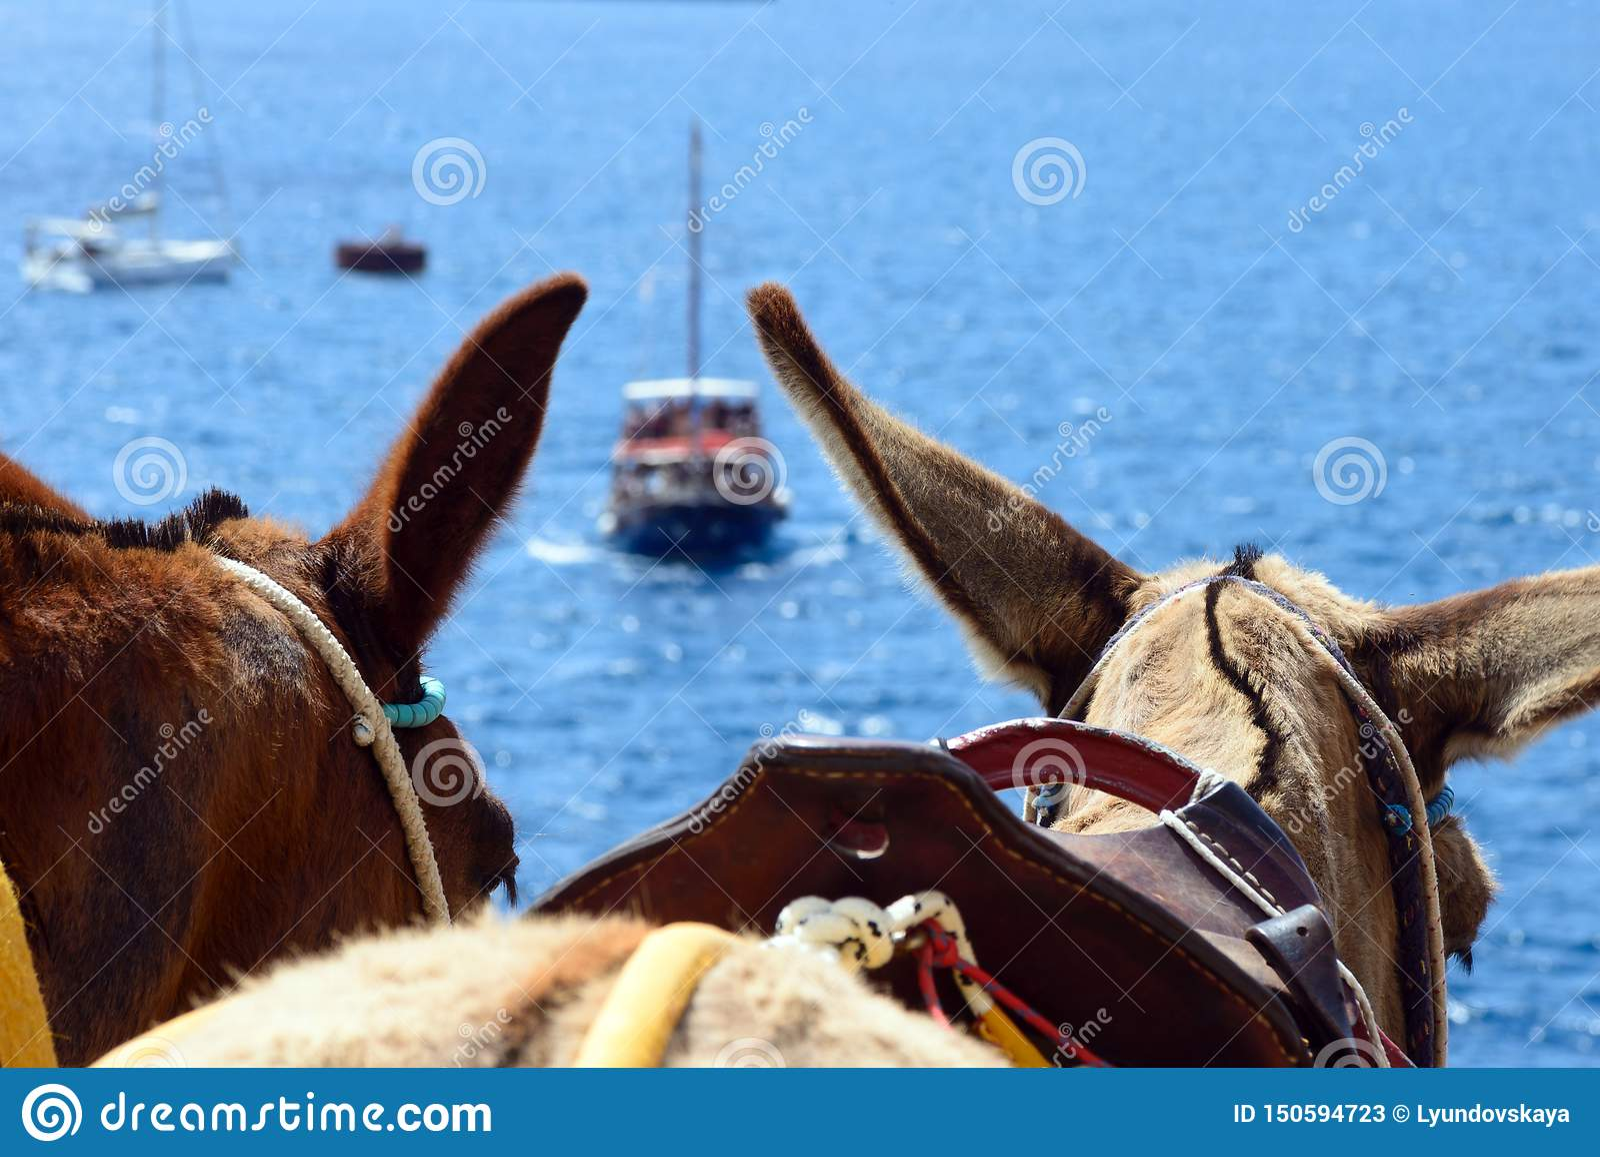 Dark horse ears, traditional transport on the island of Santorini.